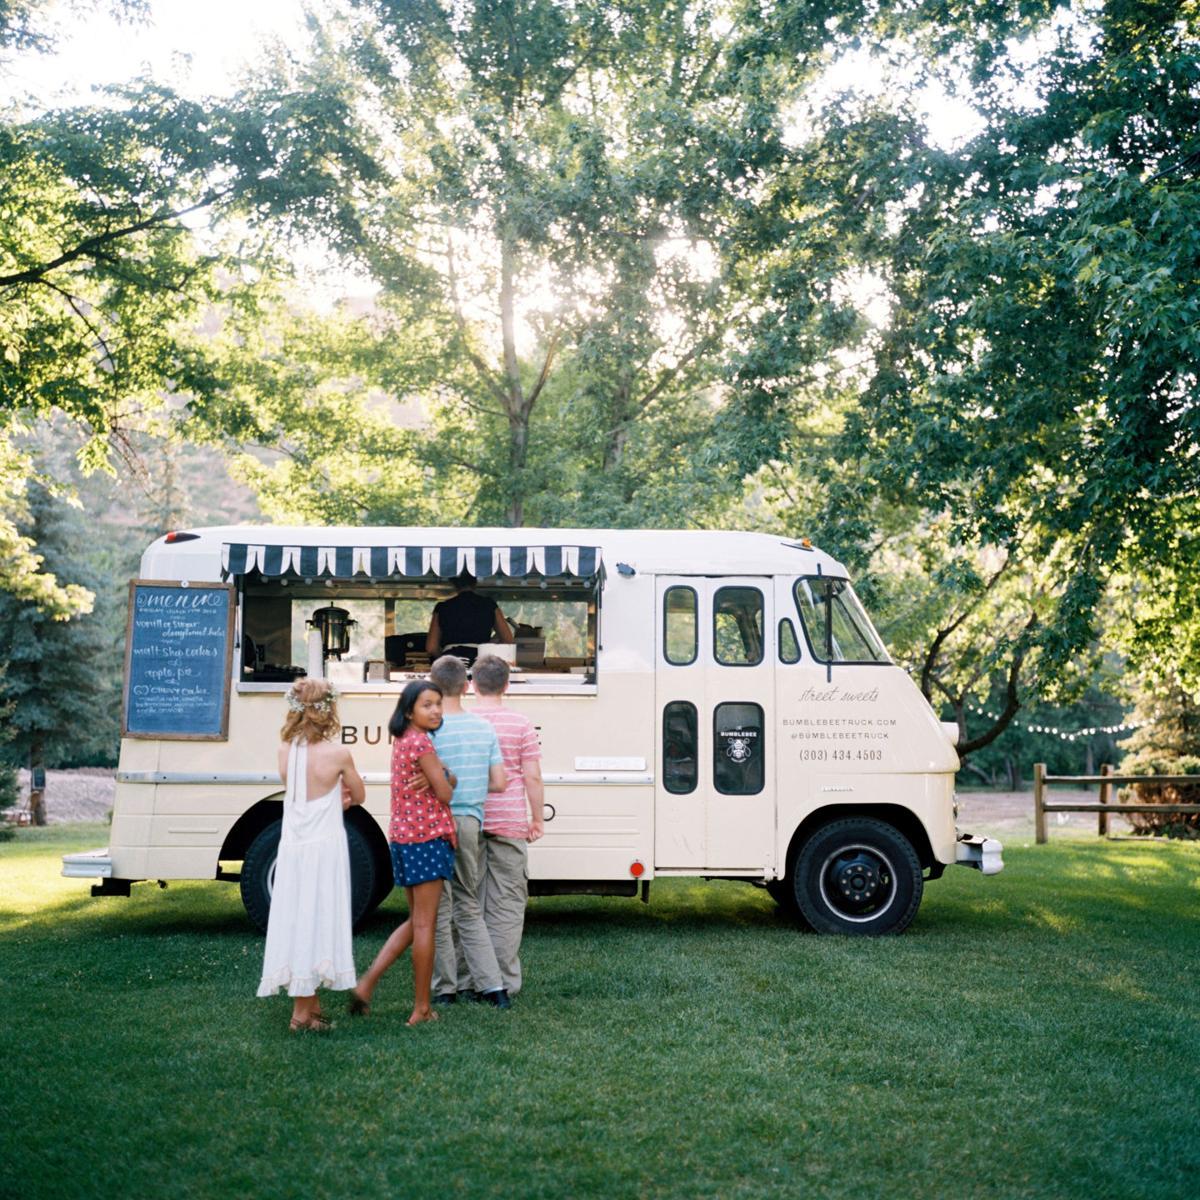 Food Truck Wedding Ideas: Planning A Wedding? Say 'I Do' To Food Trucks